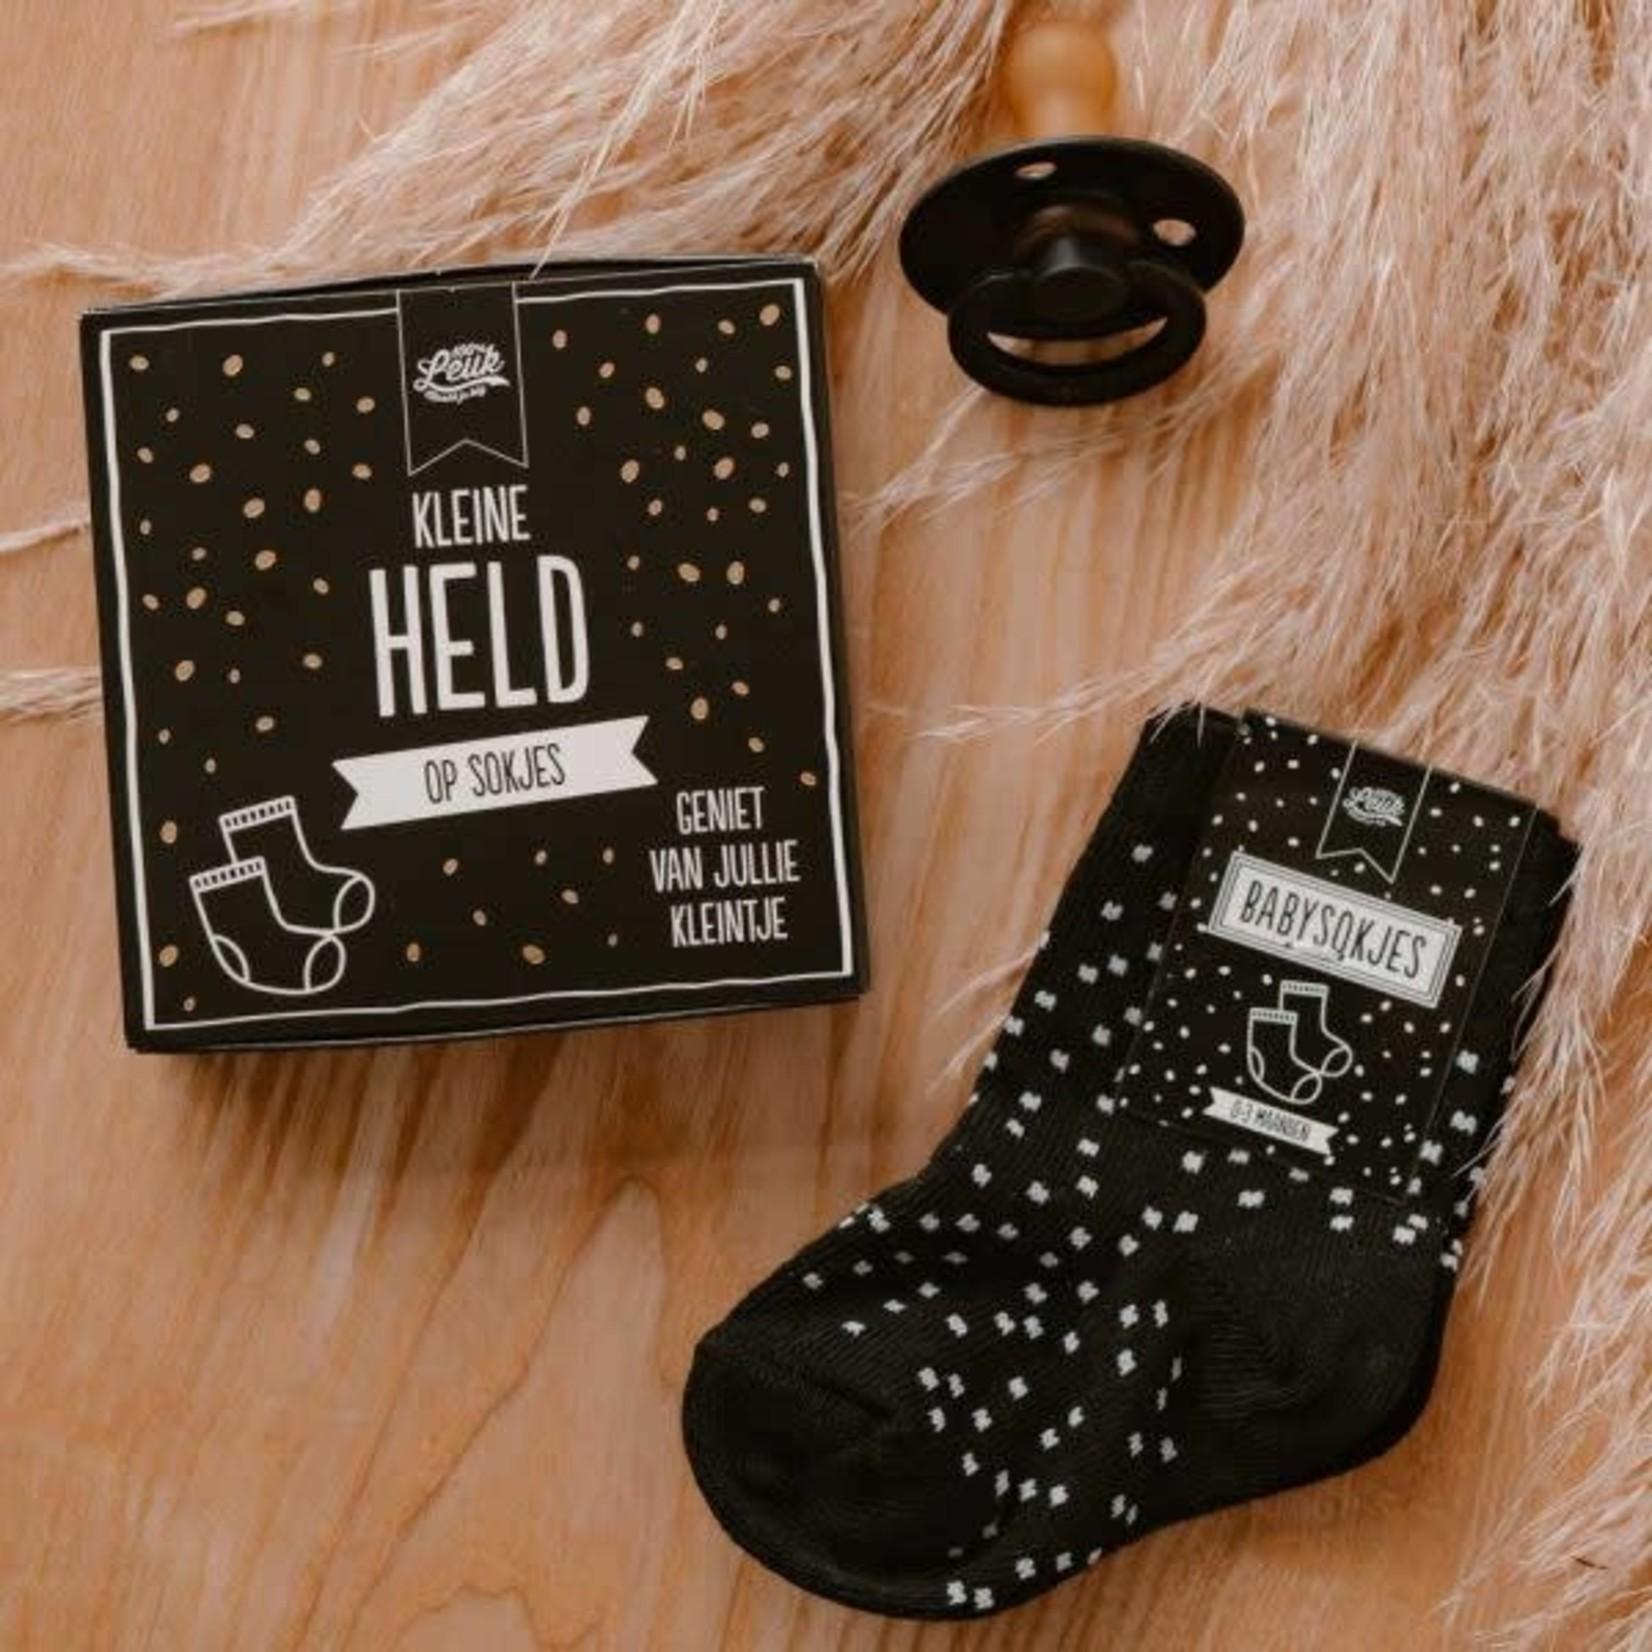 100% leuk Kleine held op sokken